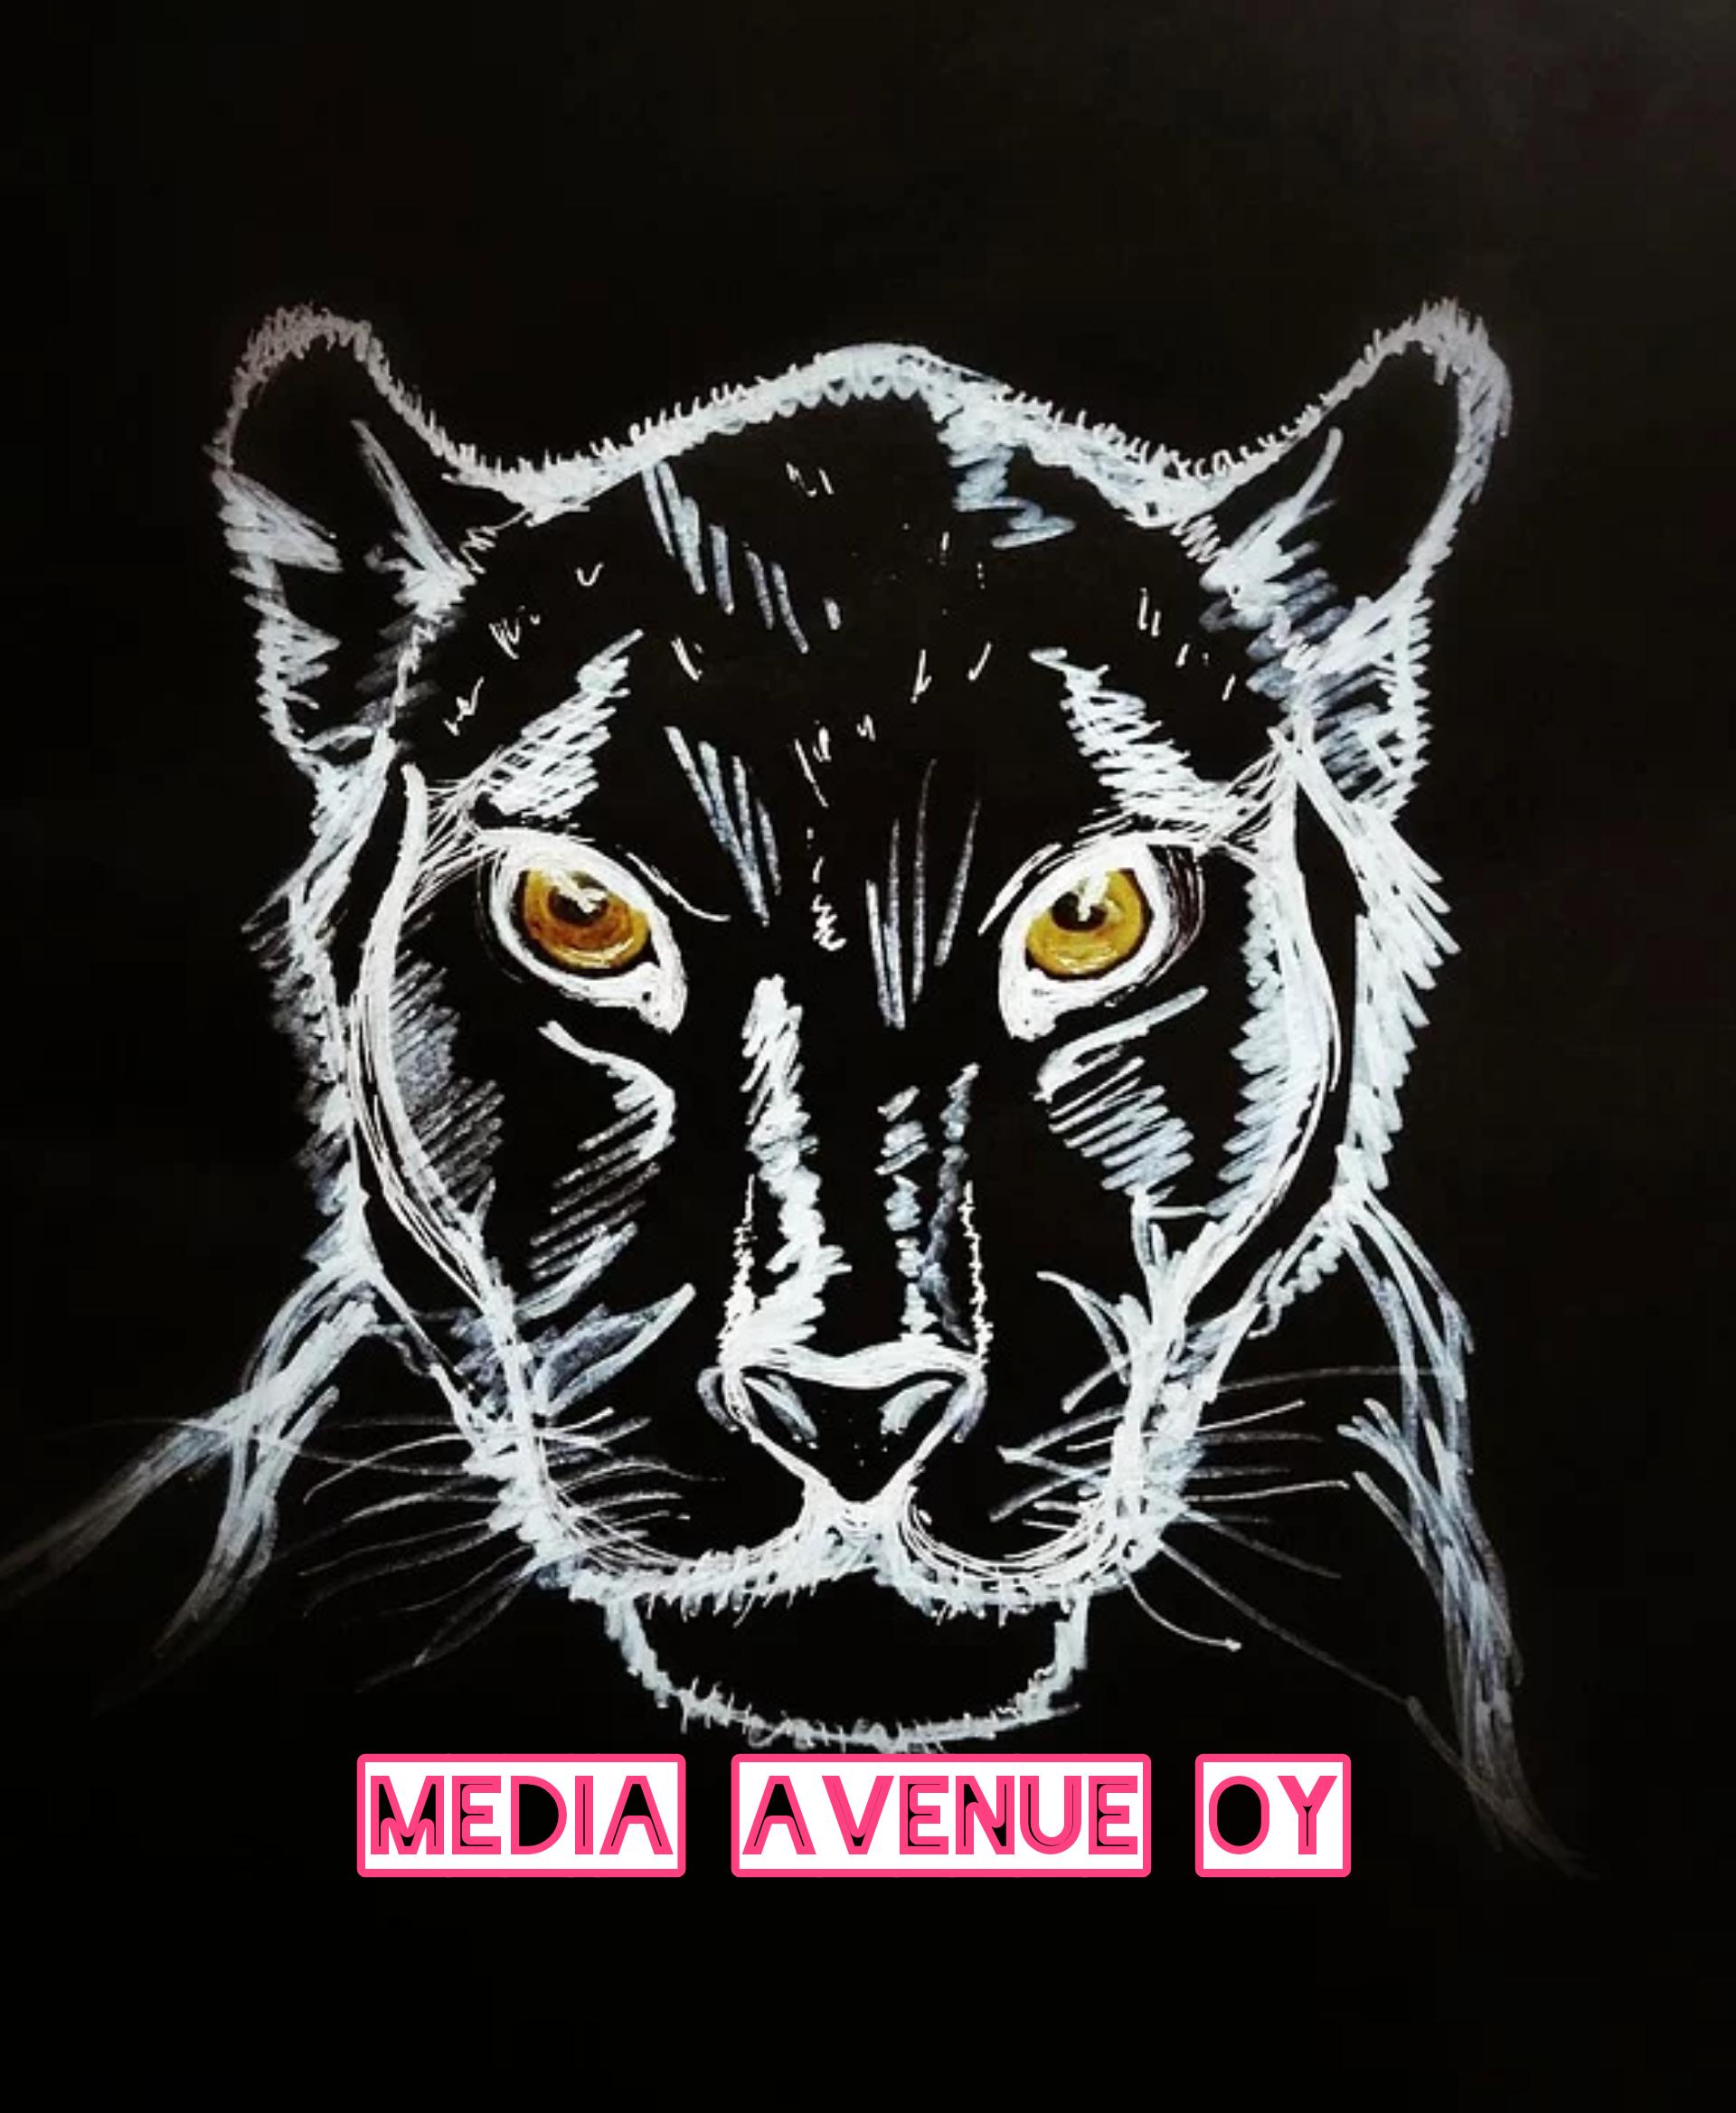 Media Avenue Oy / Paakkari Markus logo